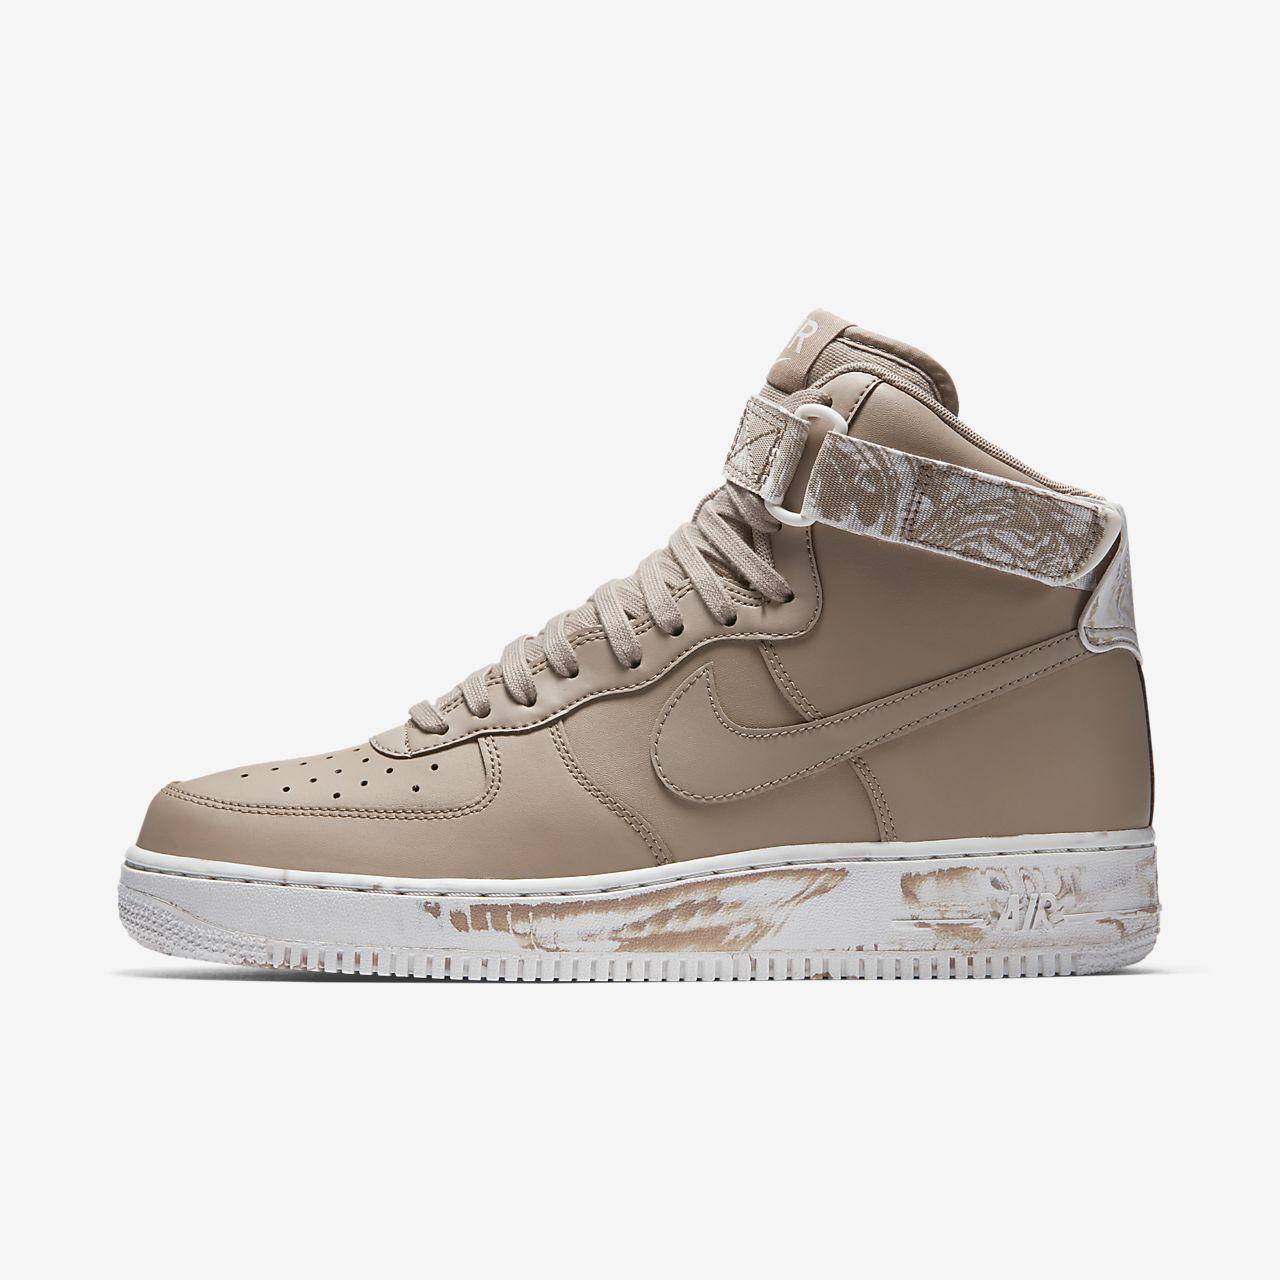 nike air force 1 high khaki